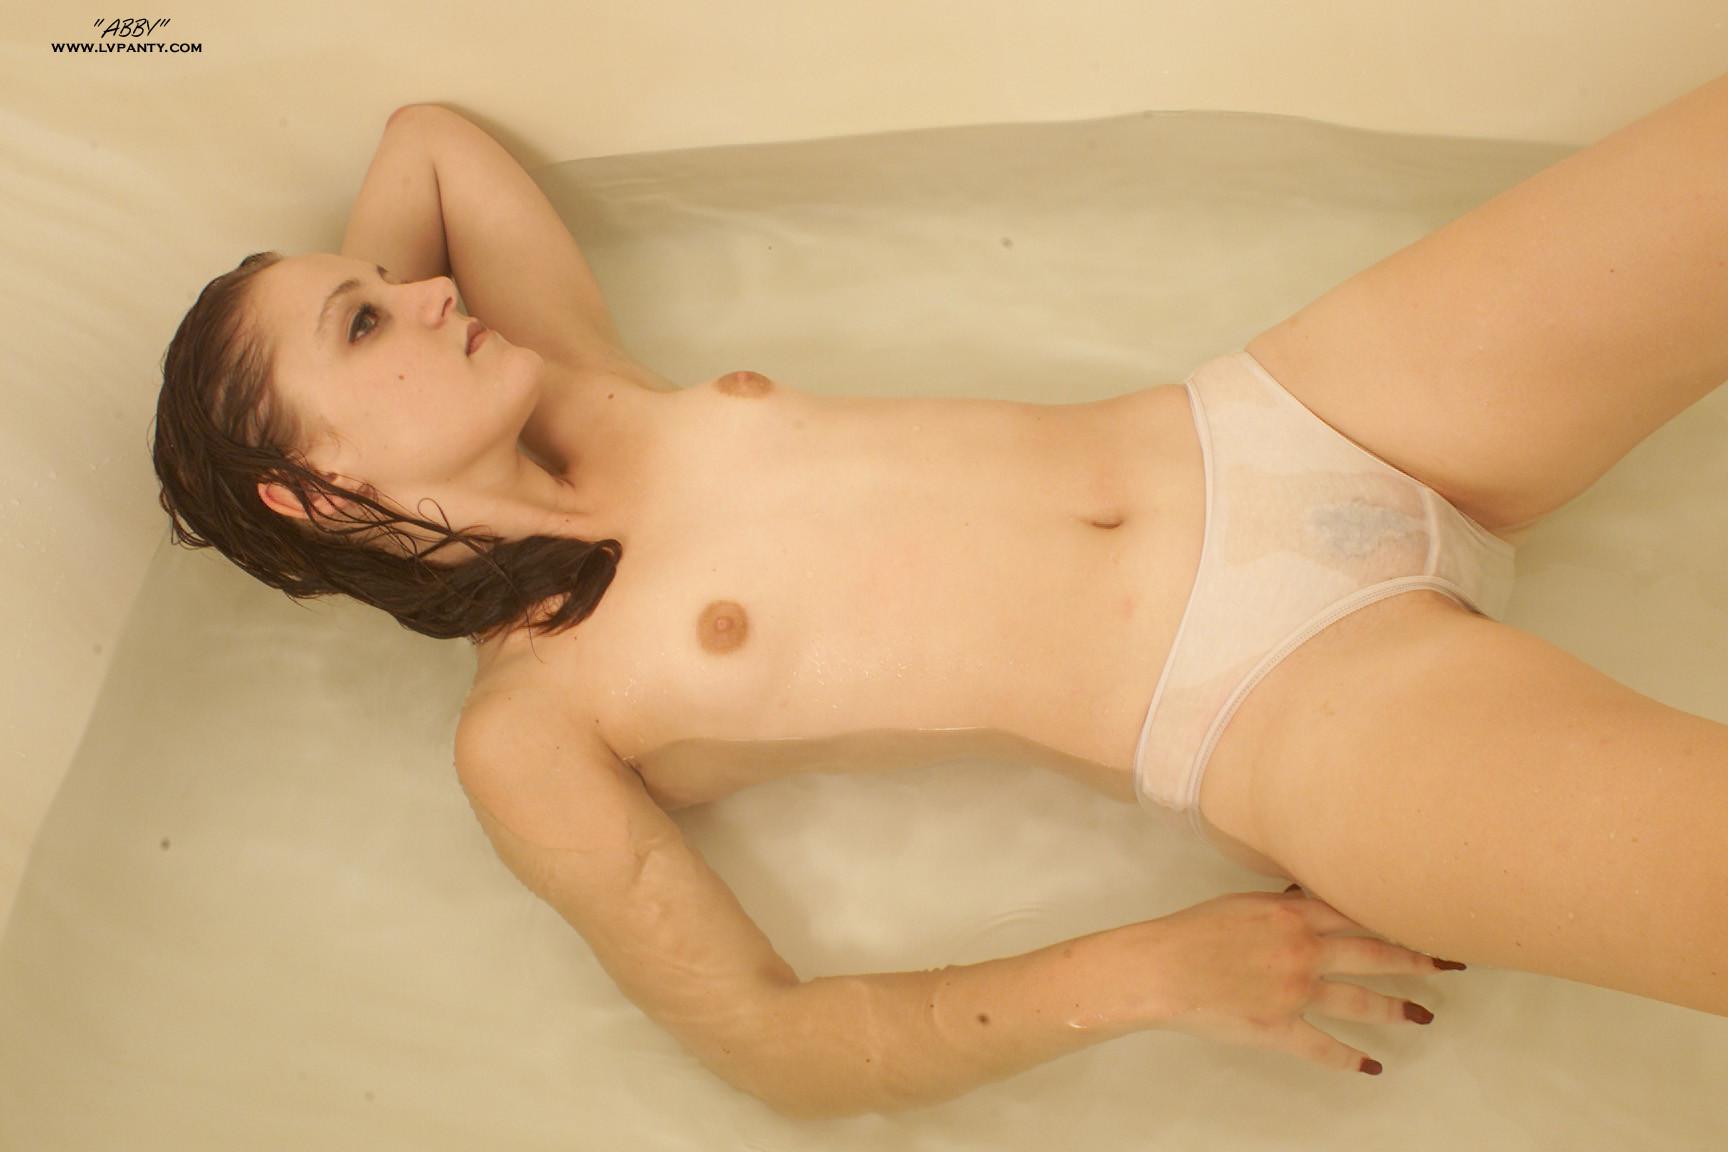 Tube porn up free porn videos XXX